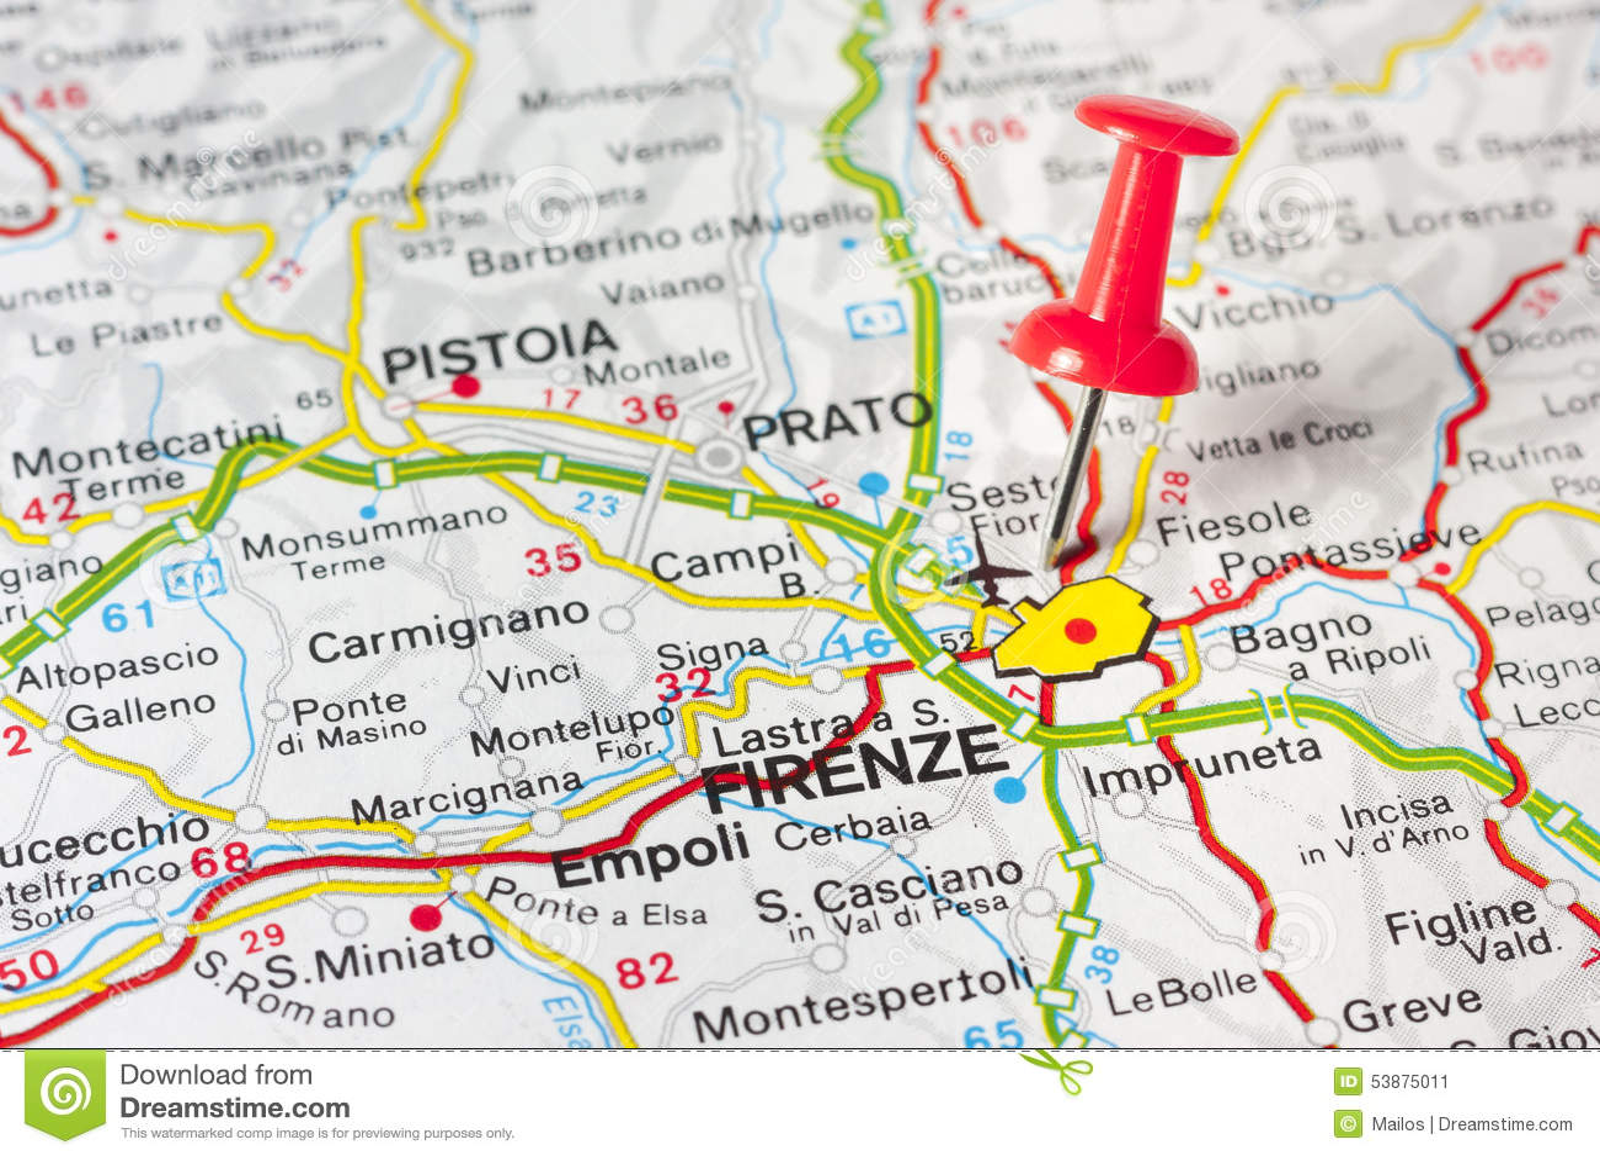 Florence On A Map Stock Image Image Of Vintage Destination 53875011